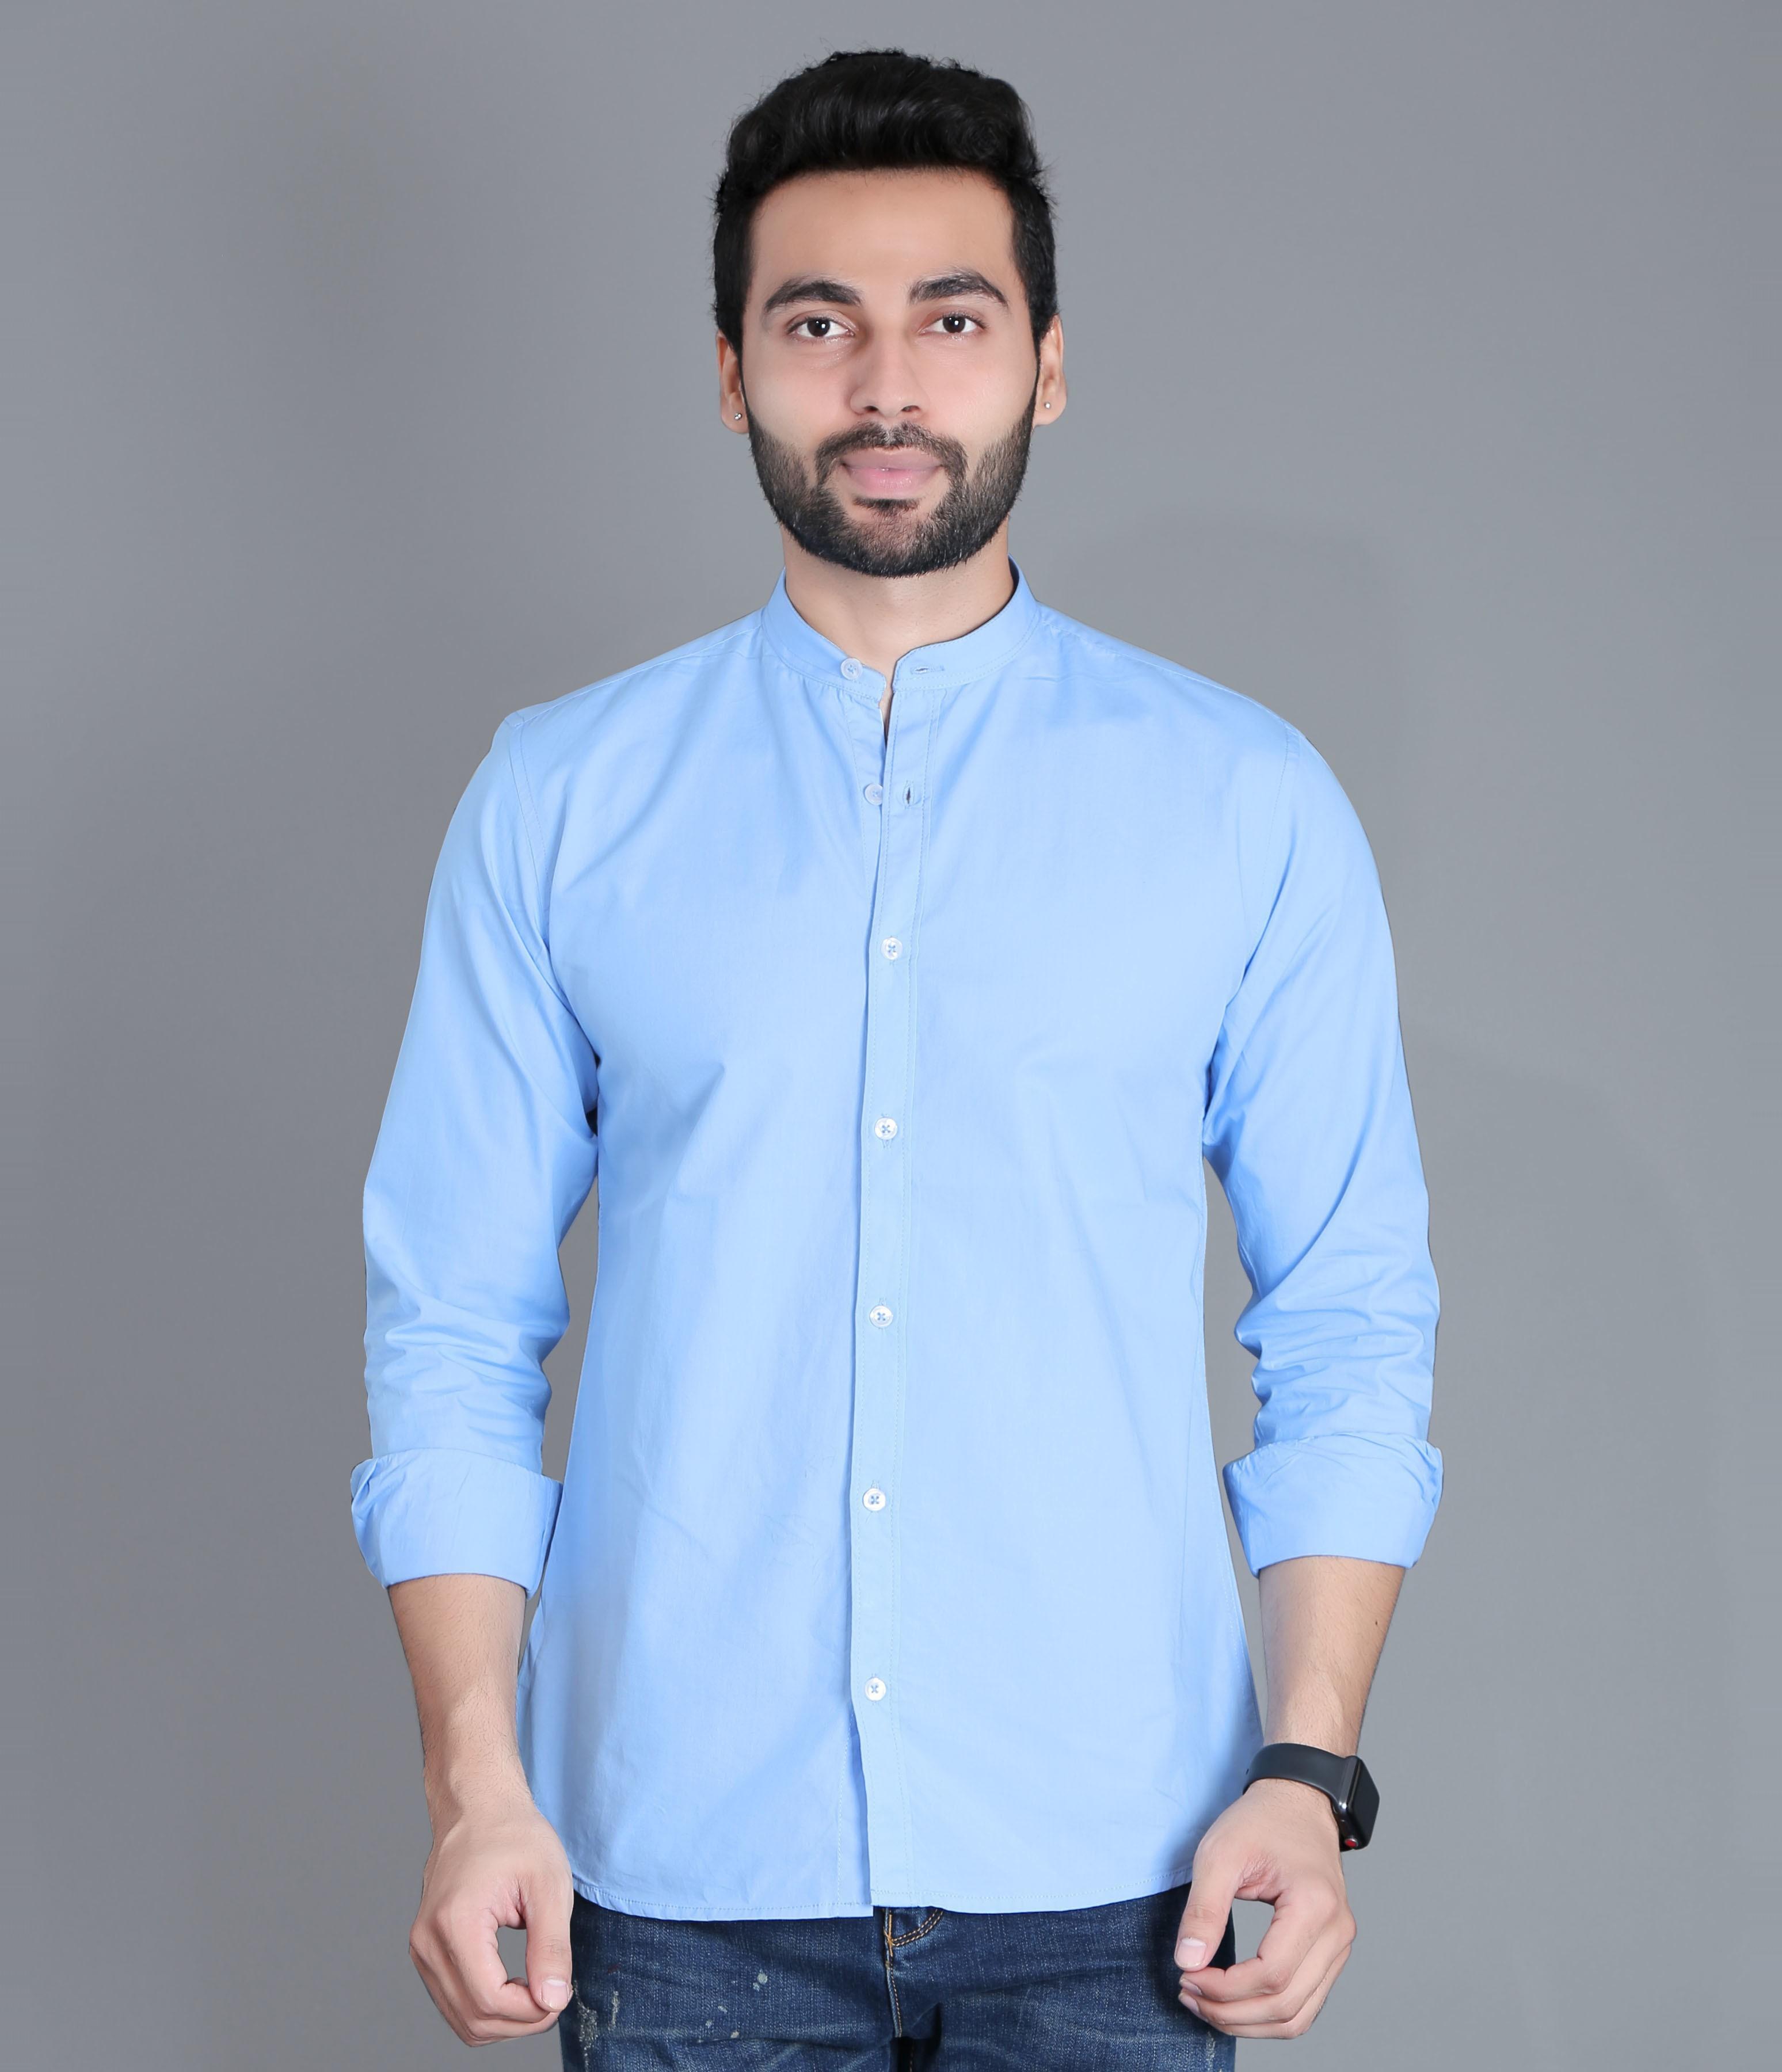 FIFTH ANFOLD Casual Mandrin Collar full Sleev/Long Sleev Sky Blue Pure Cotton Plain Solid Men Shirt